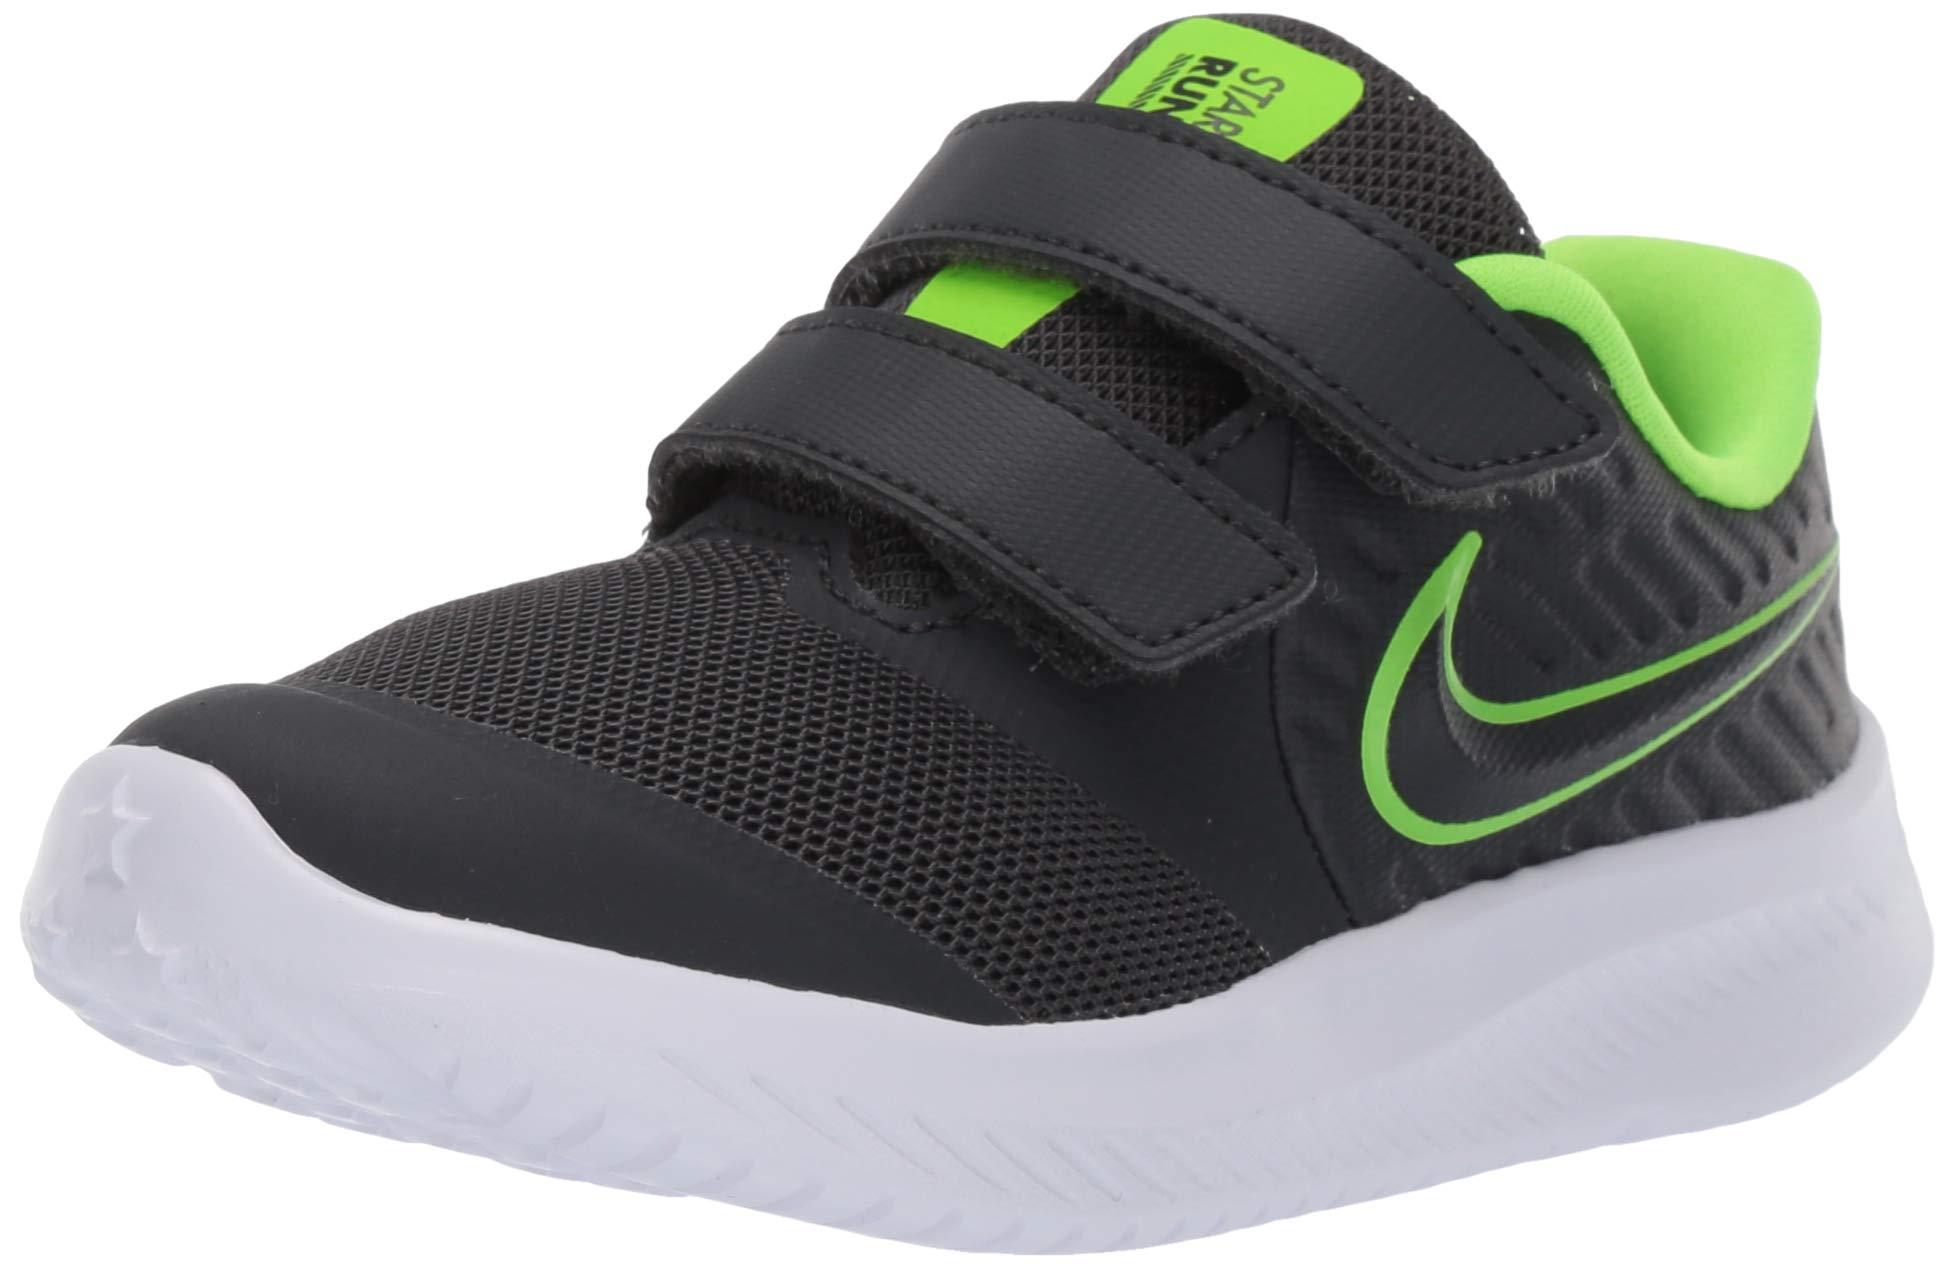 Nike Kids Star Runner 2 (TDV) Sneaker Anthracite/Electric Green - White 8C Toddler US Toddler by Nike